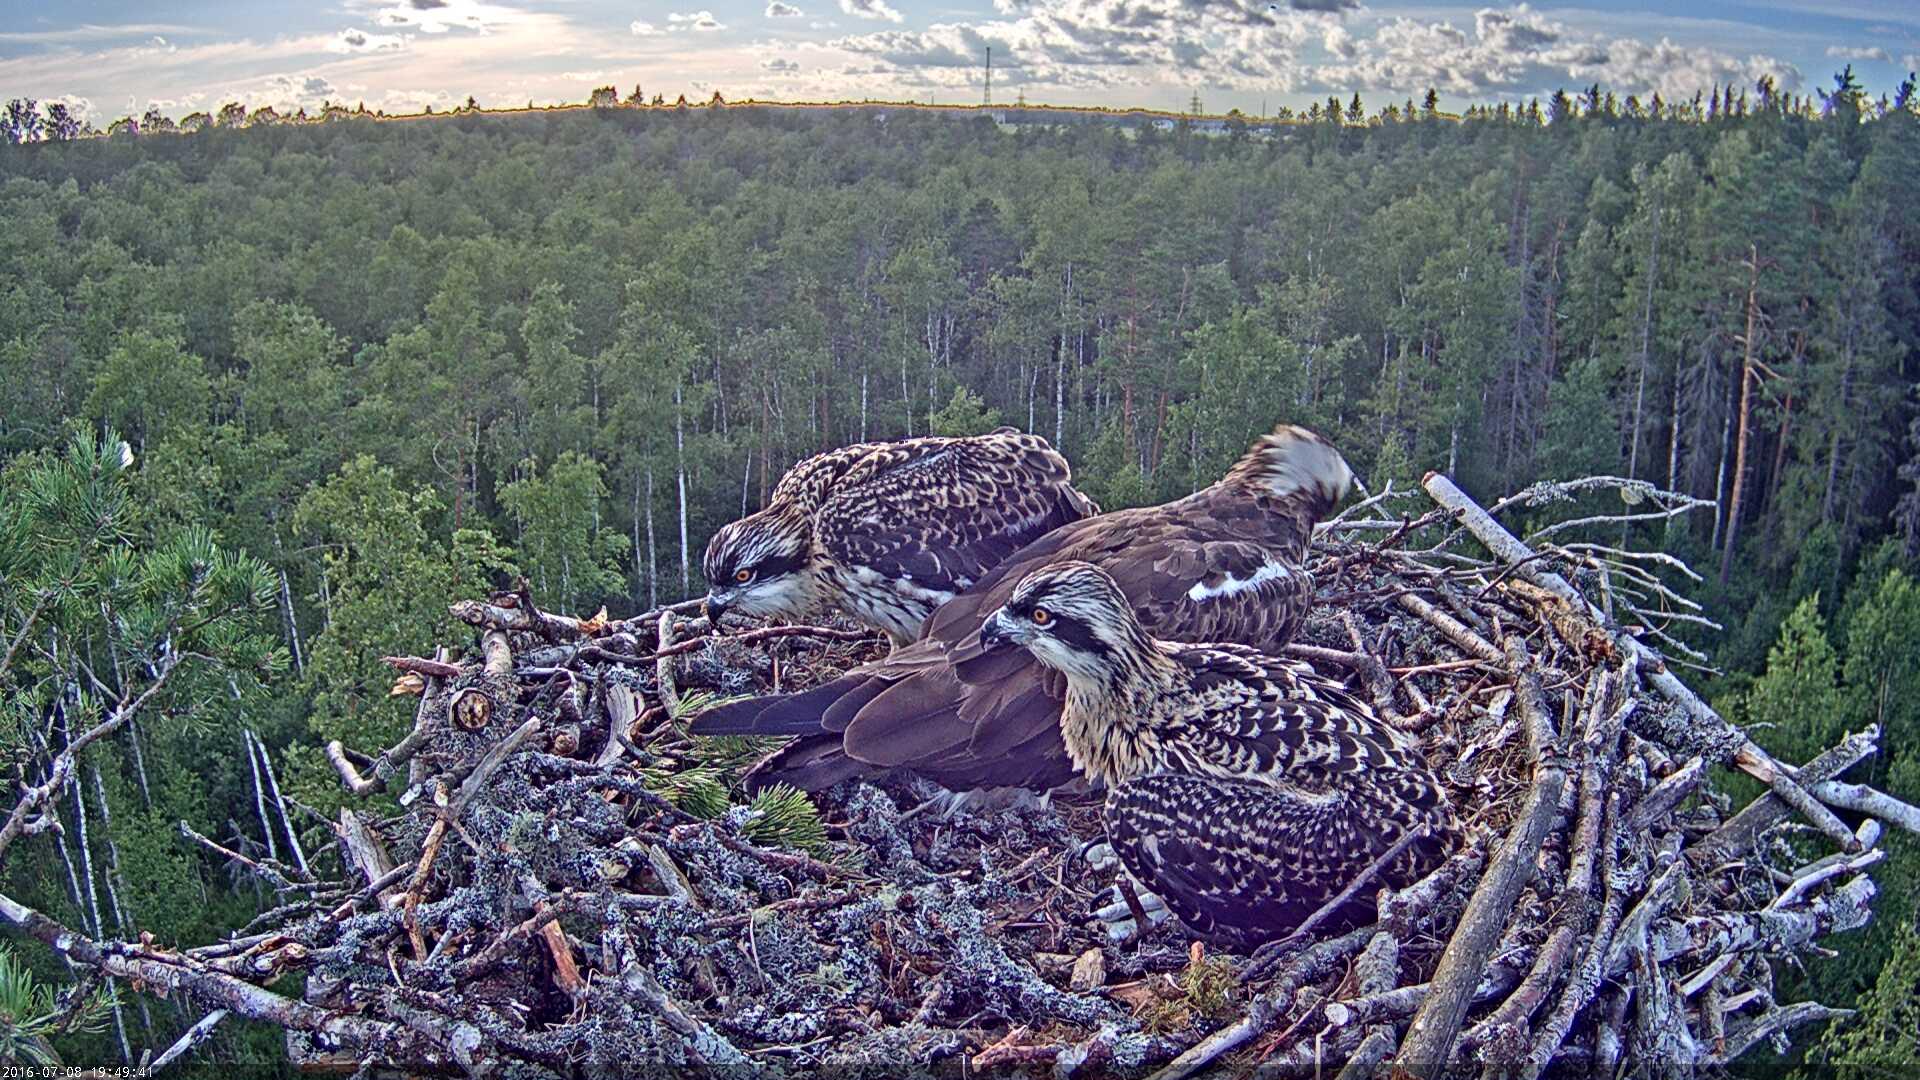 Estonian Osprey Nest Mai & Mati 2016 Kalakotkas-2016-07-08-19-49